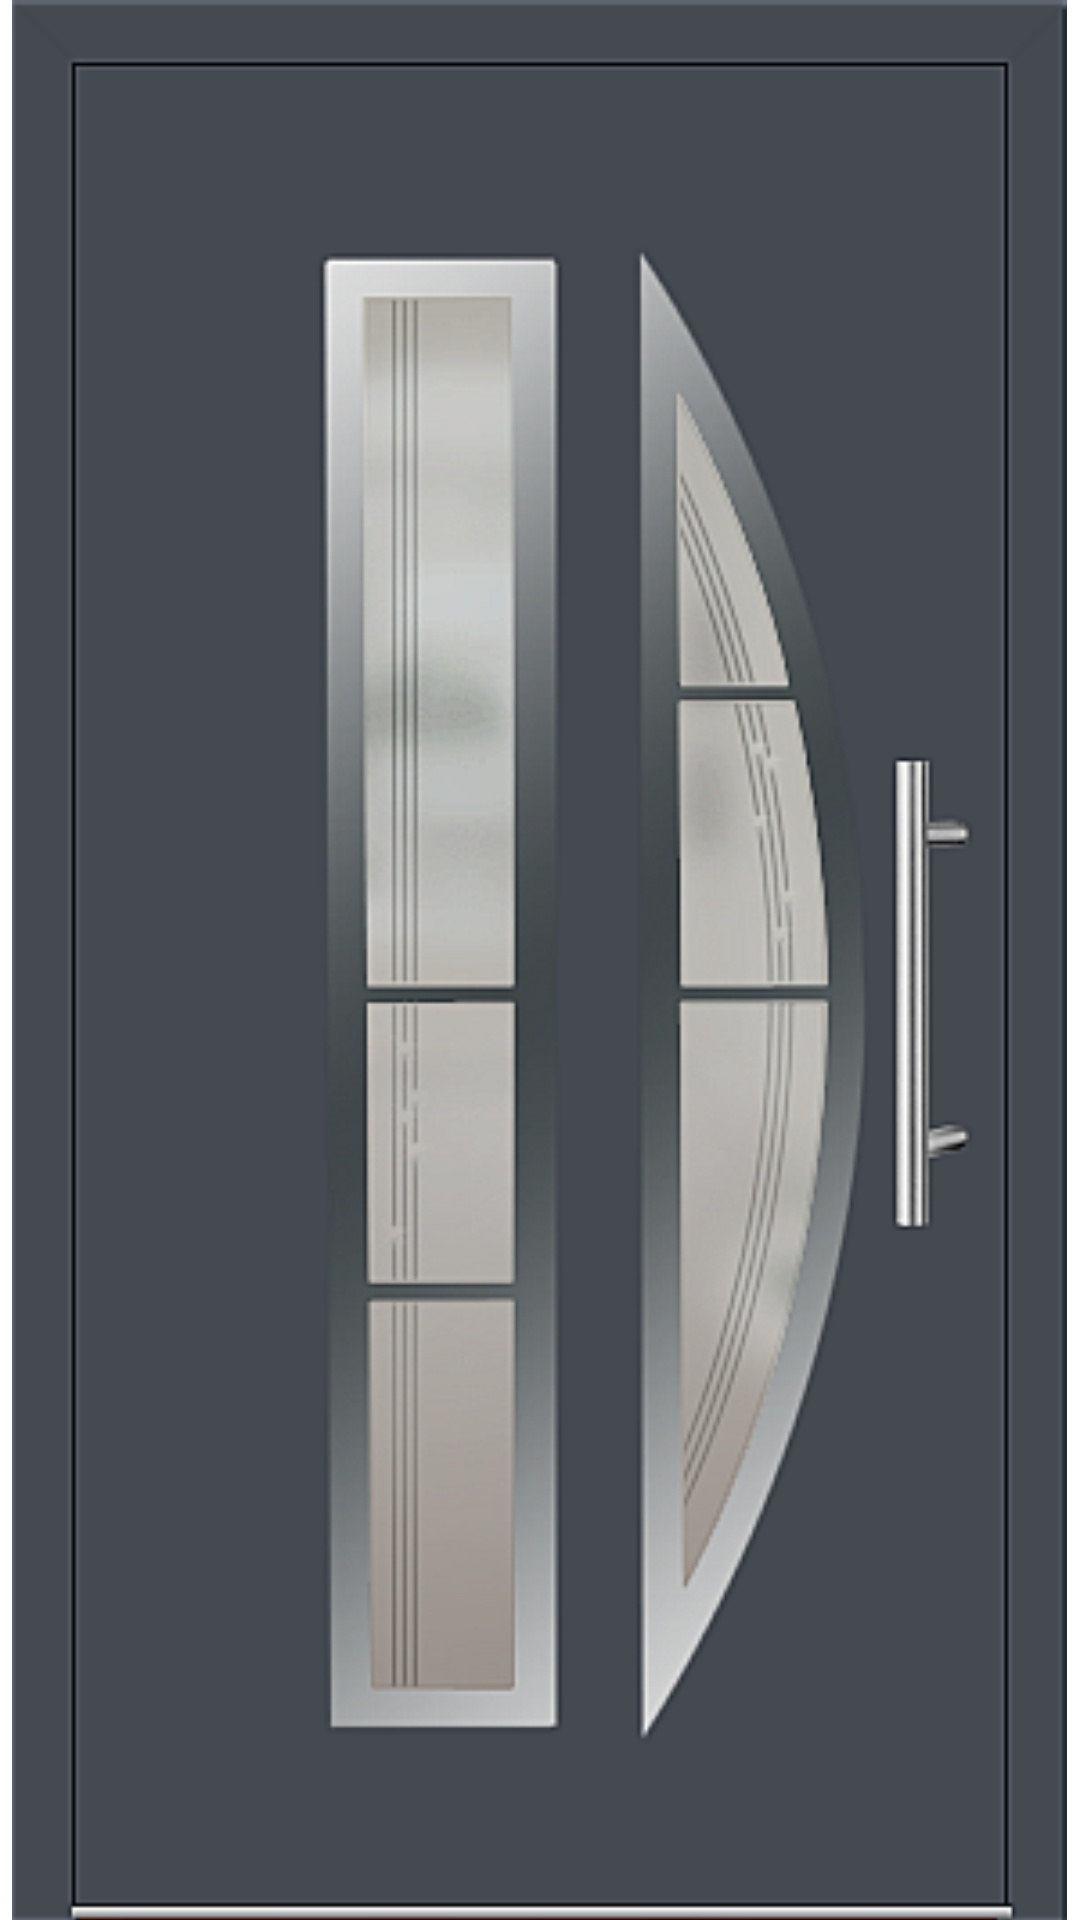 Aluminium Haustür Modell 6525-75 graphitgrau